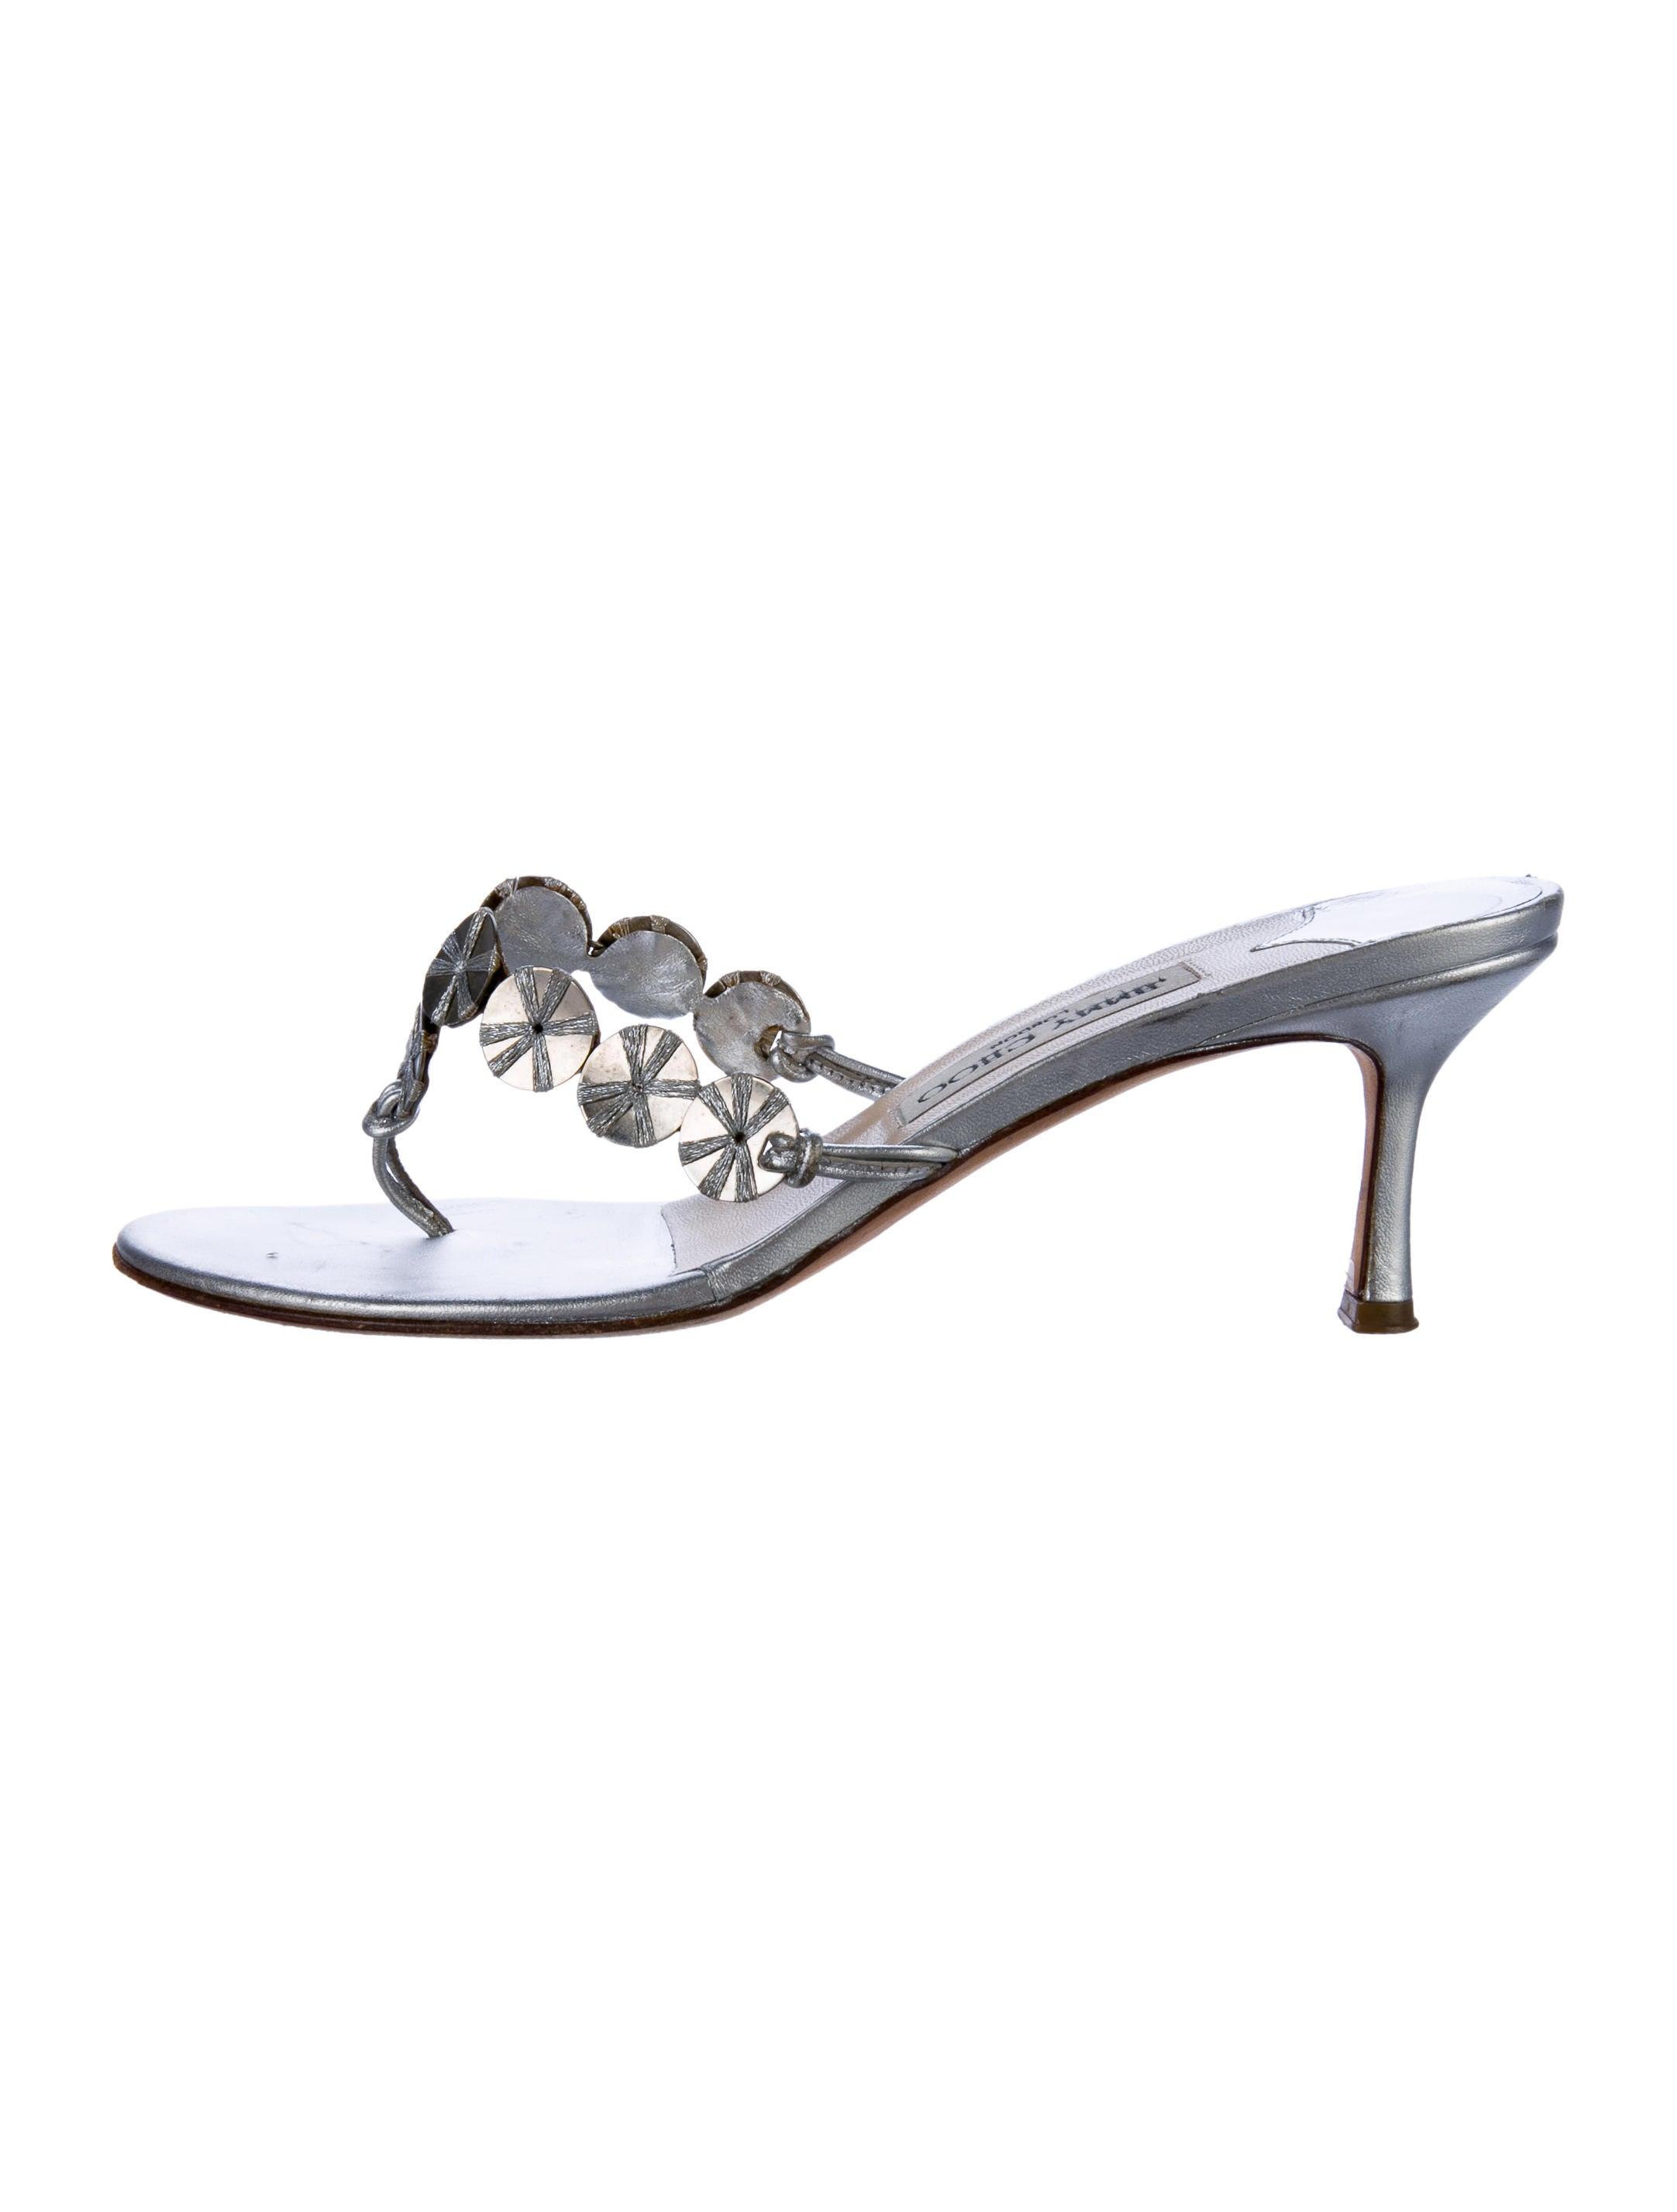 31064e4b095422 Jimmy Choo Embellished Thong Sandals - Shoes - JIM80178